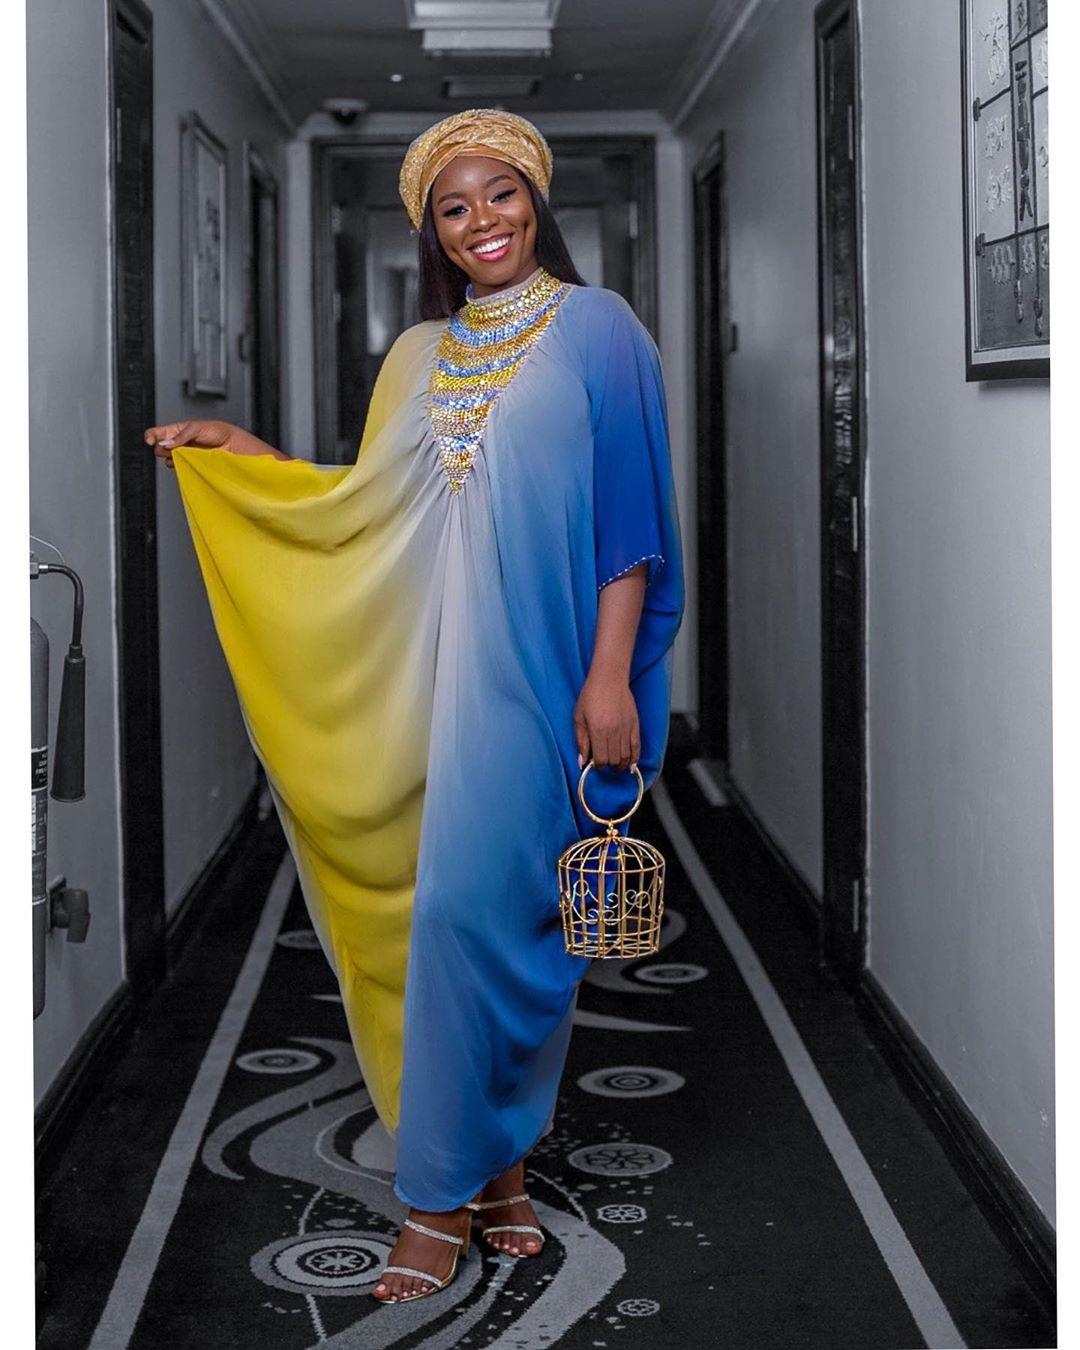 Ariyike-owolagba-ariyiike-dimples-nigerian-celebrity-weekend-style